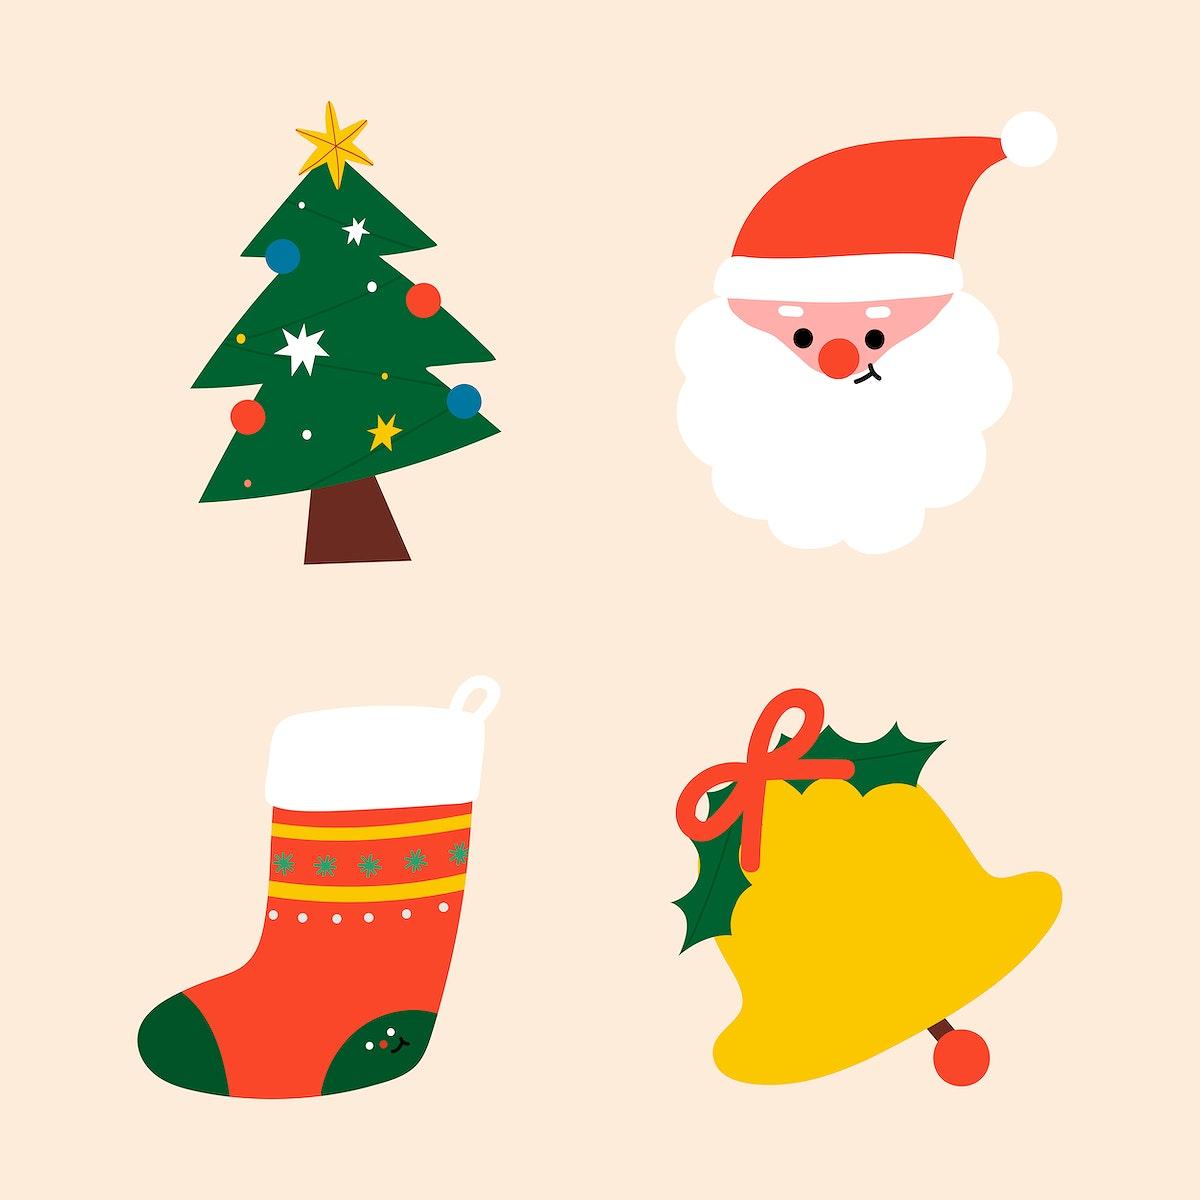 Festive decorative Christmas elements set vector